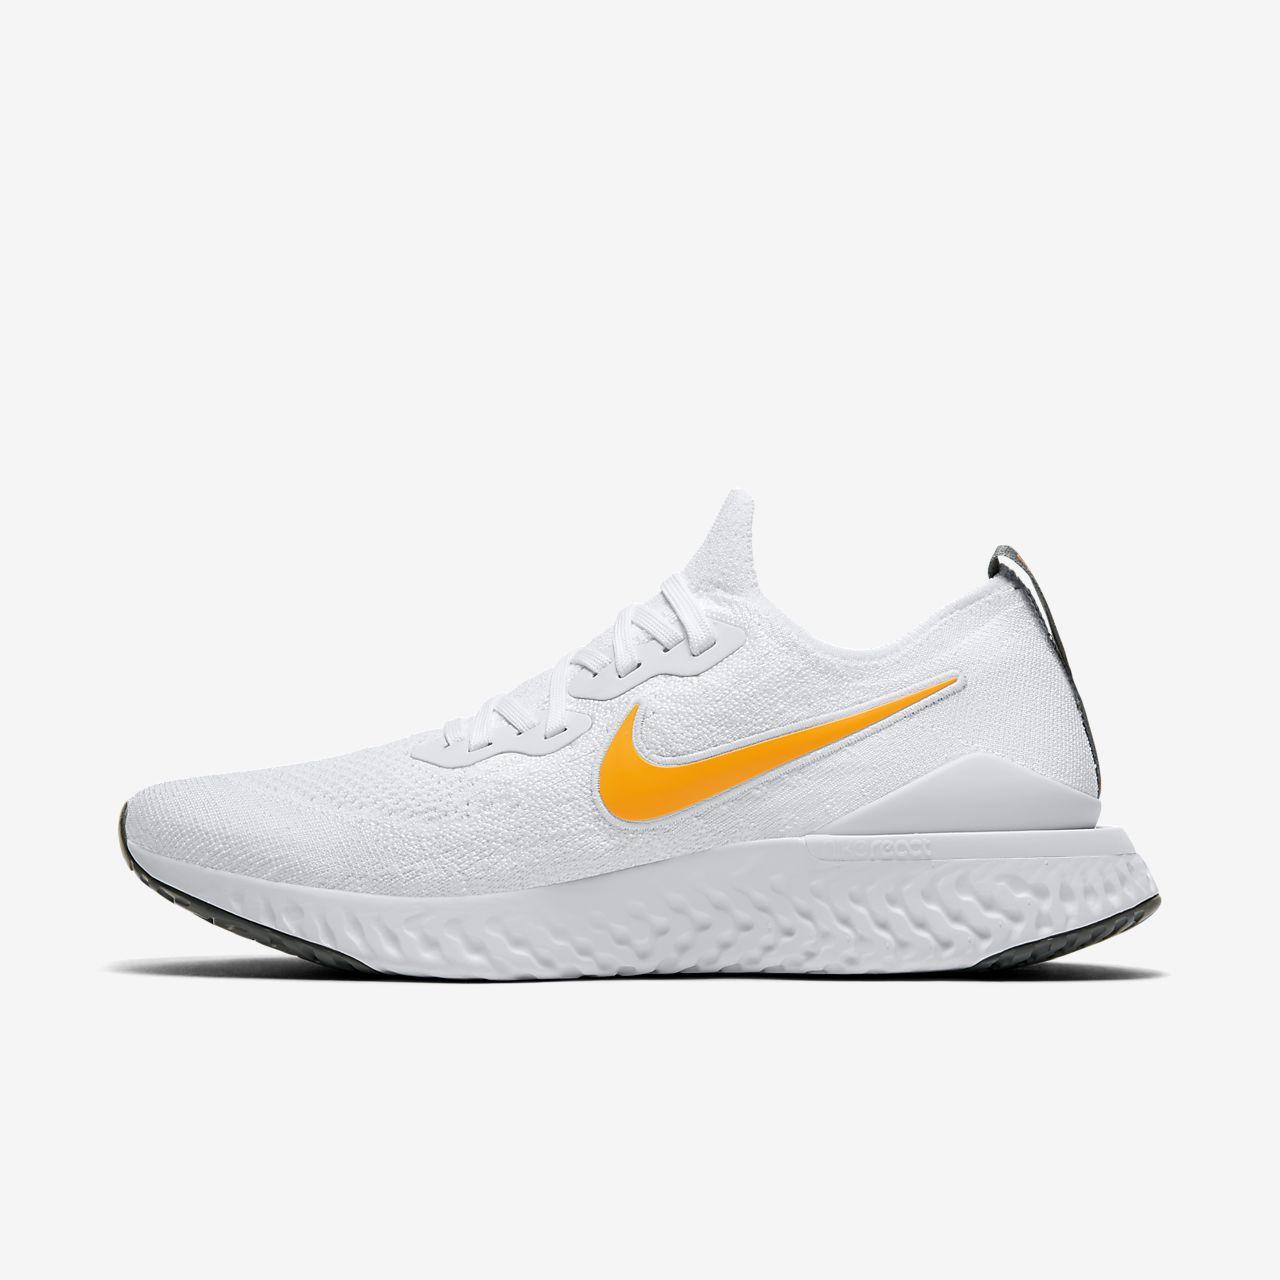 Nike Herren Epic React Flyknit Fitnessschuhe